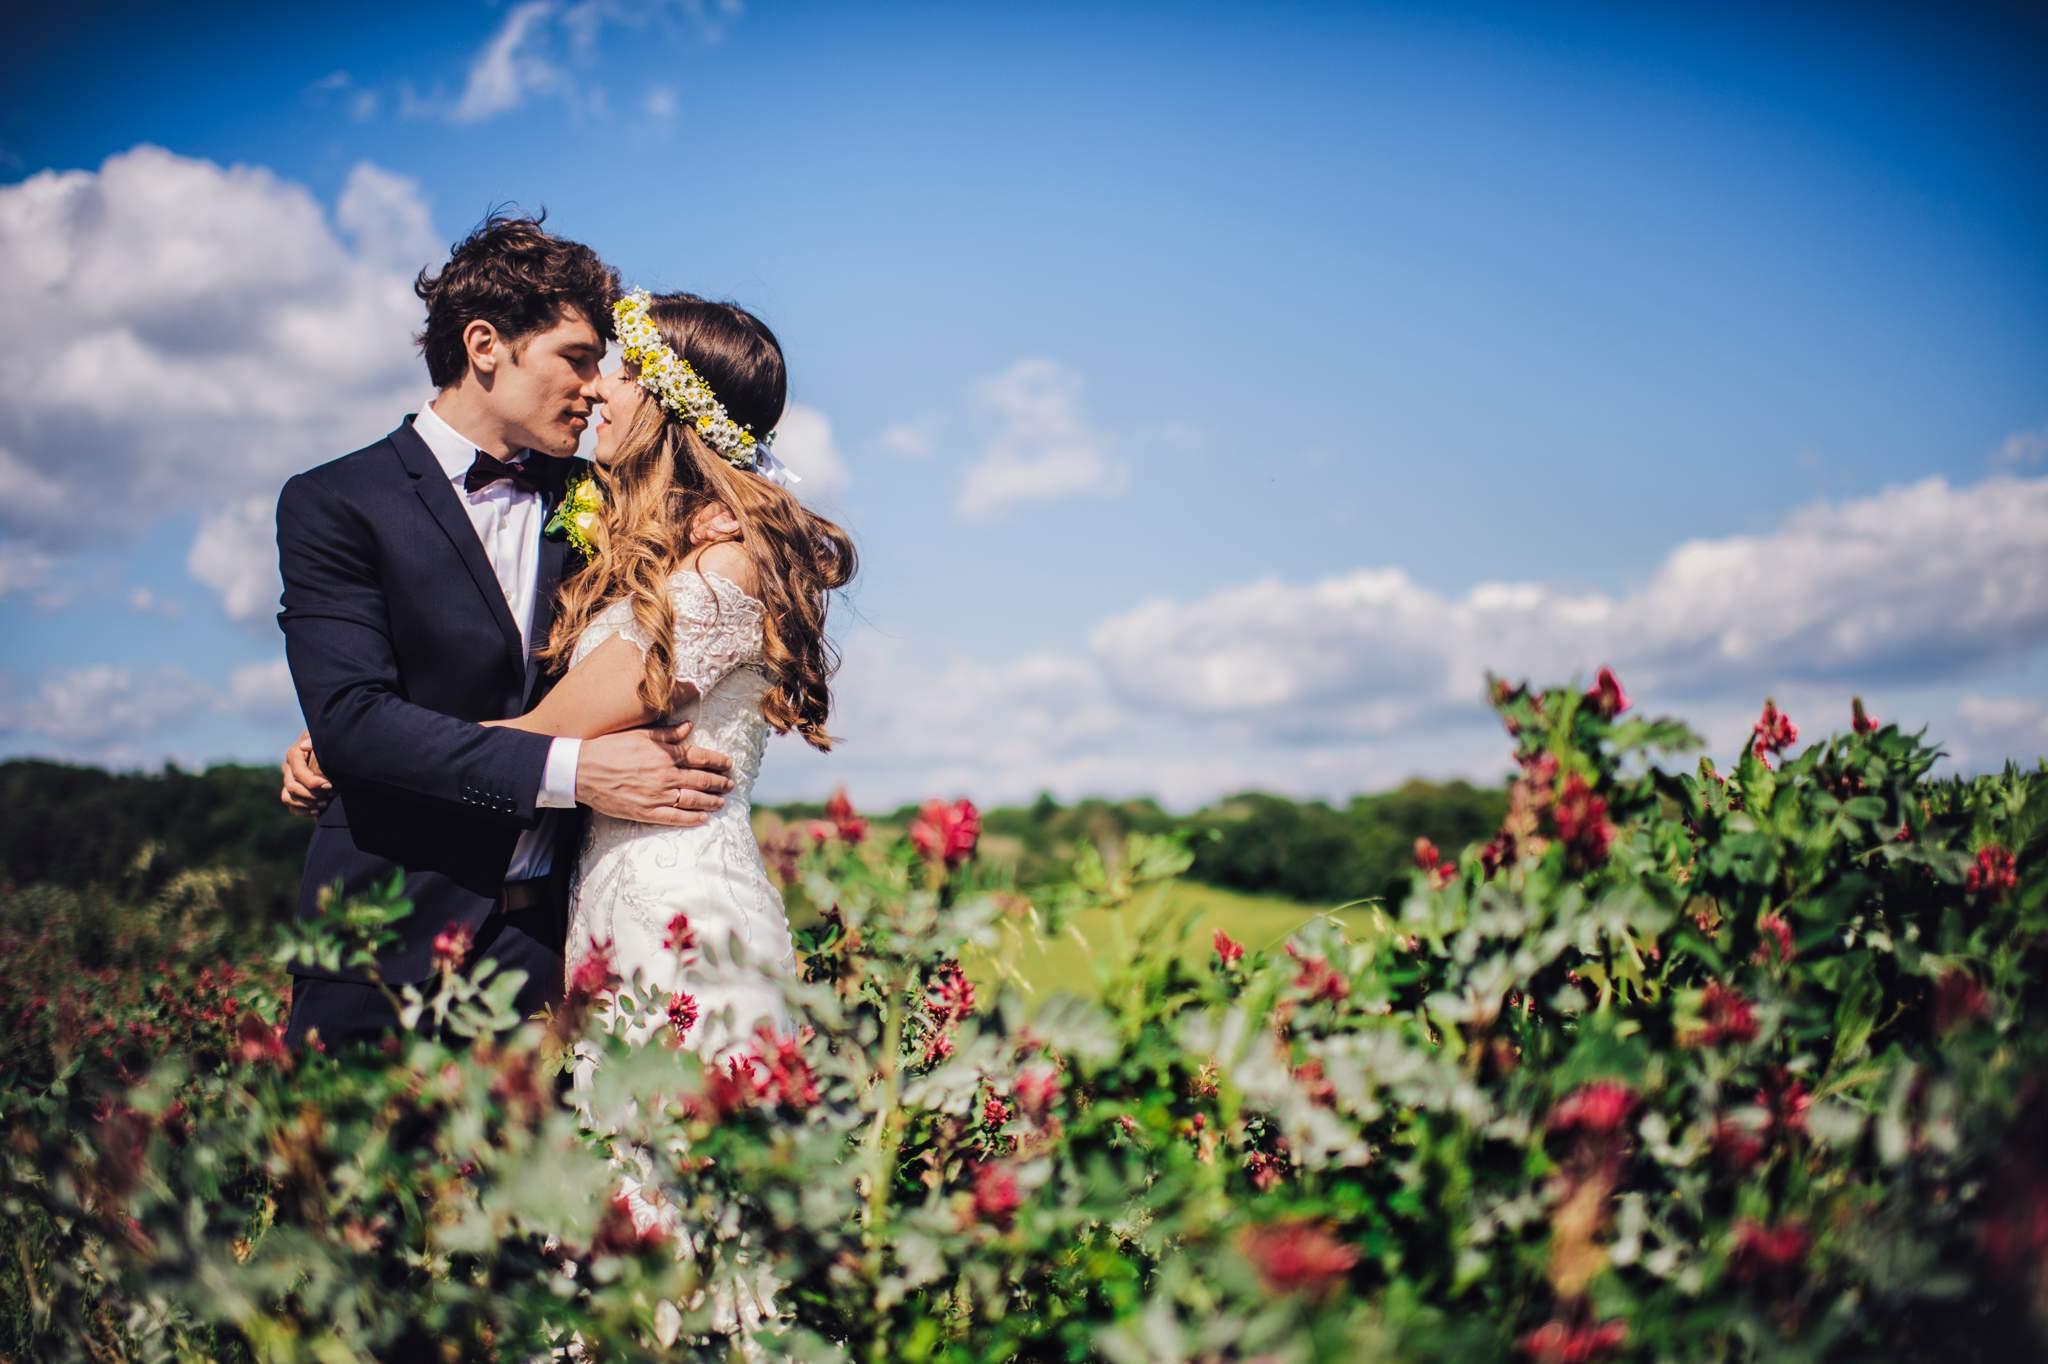 37wedding-photographer-tuscany-siena